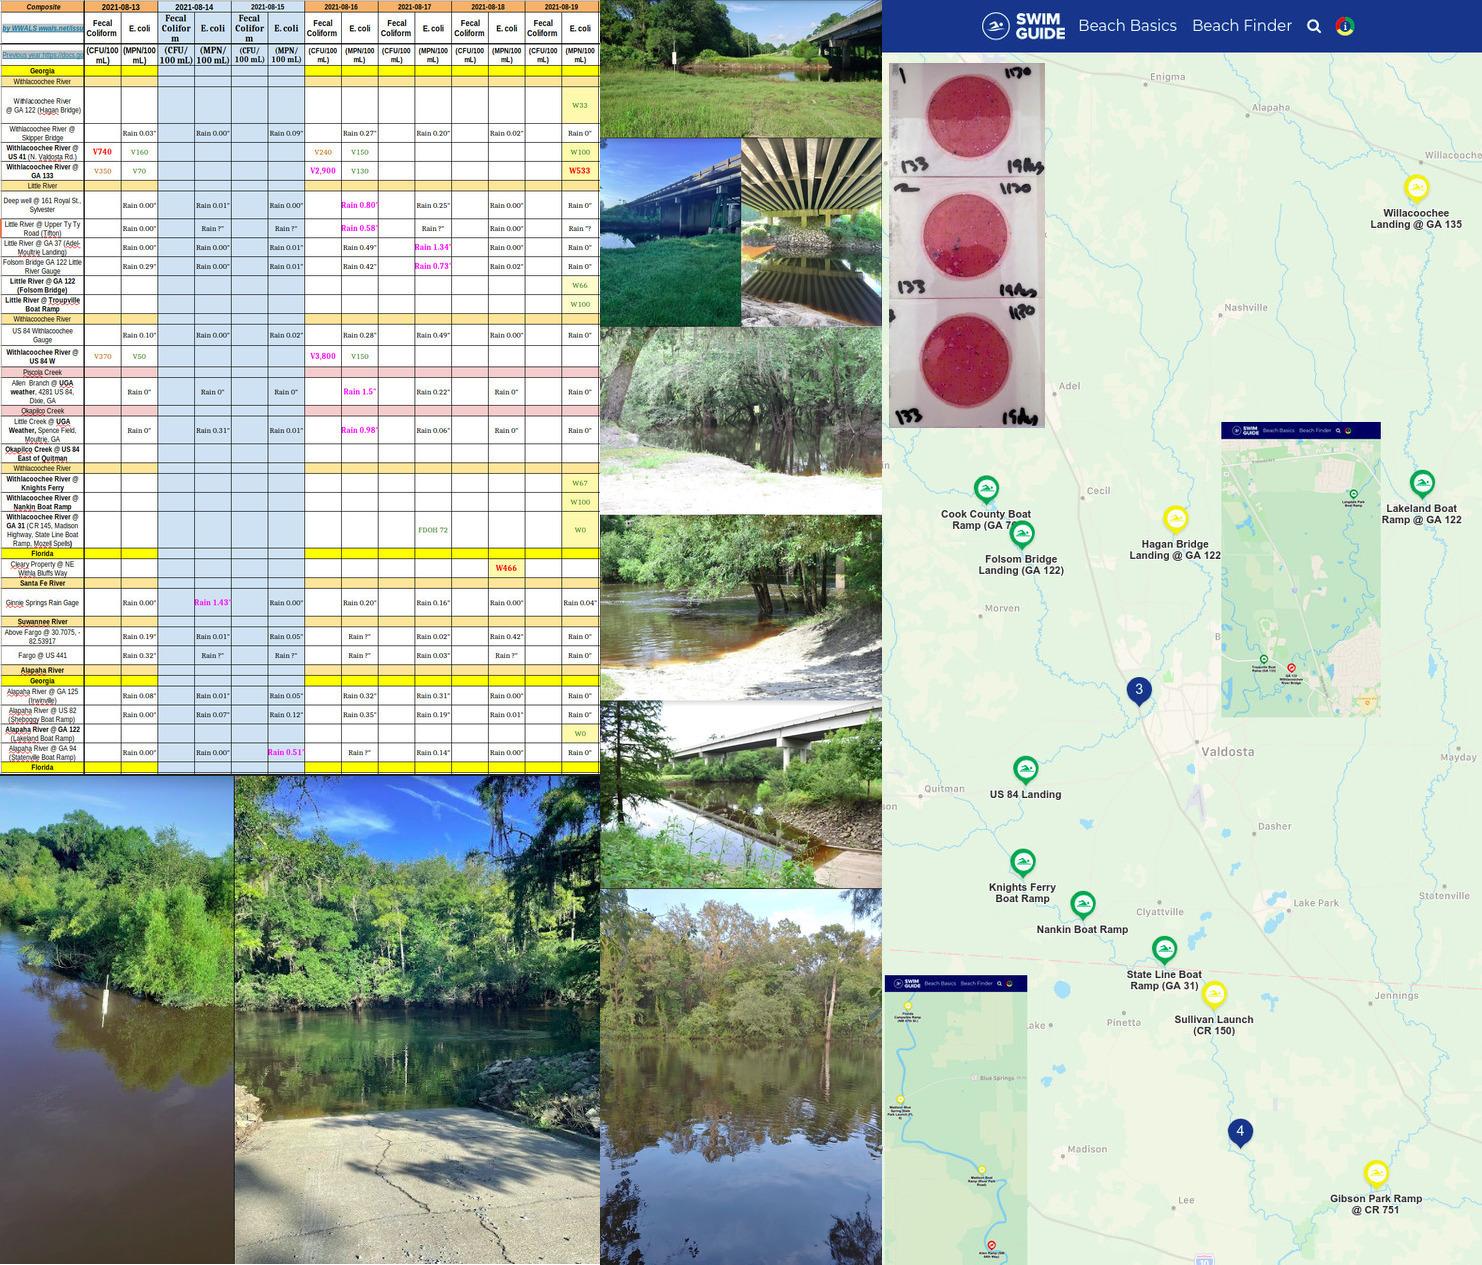 [Chart, Rivers, Plates, Swim Guide]